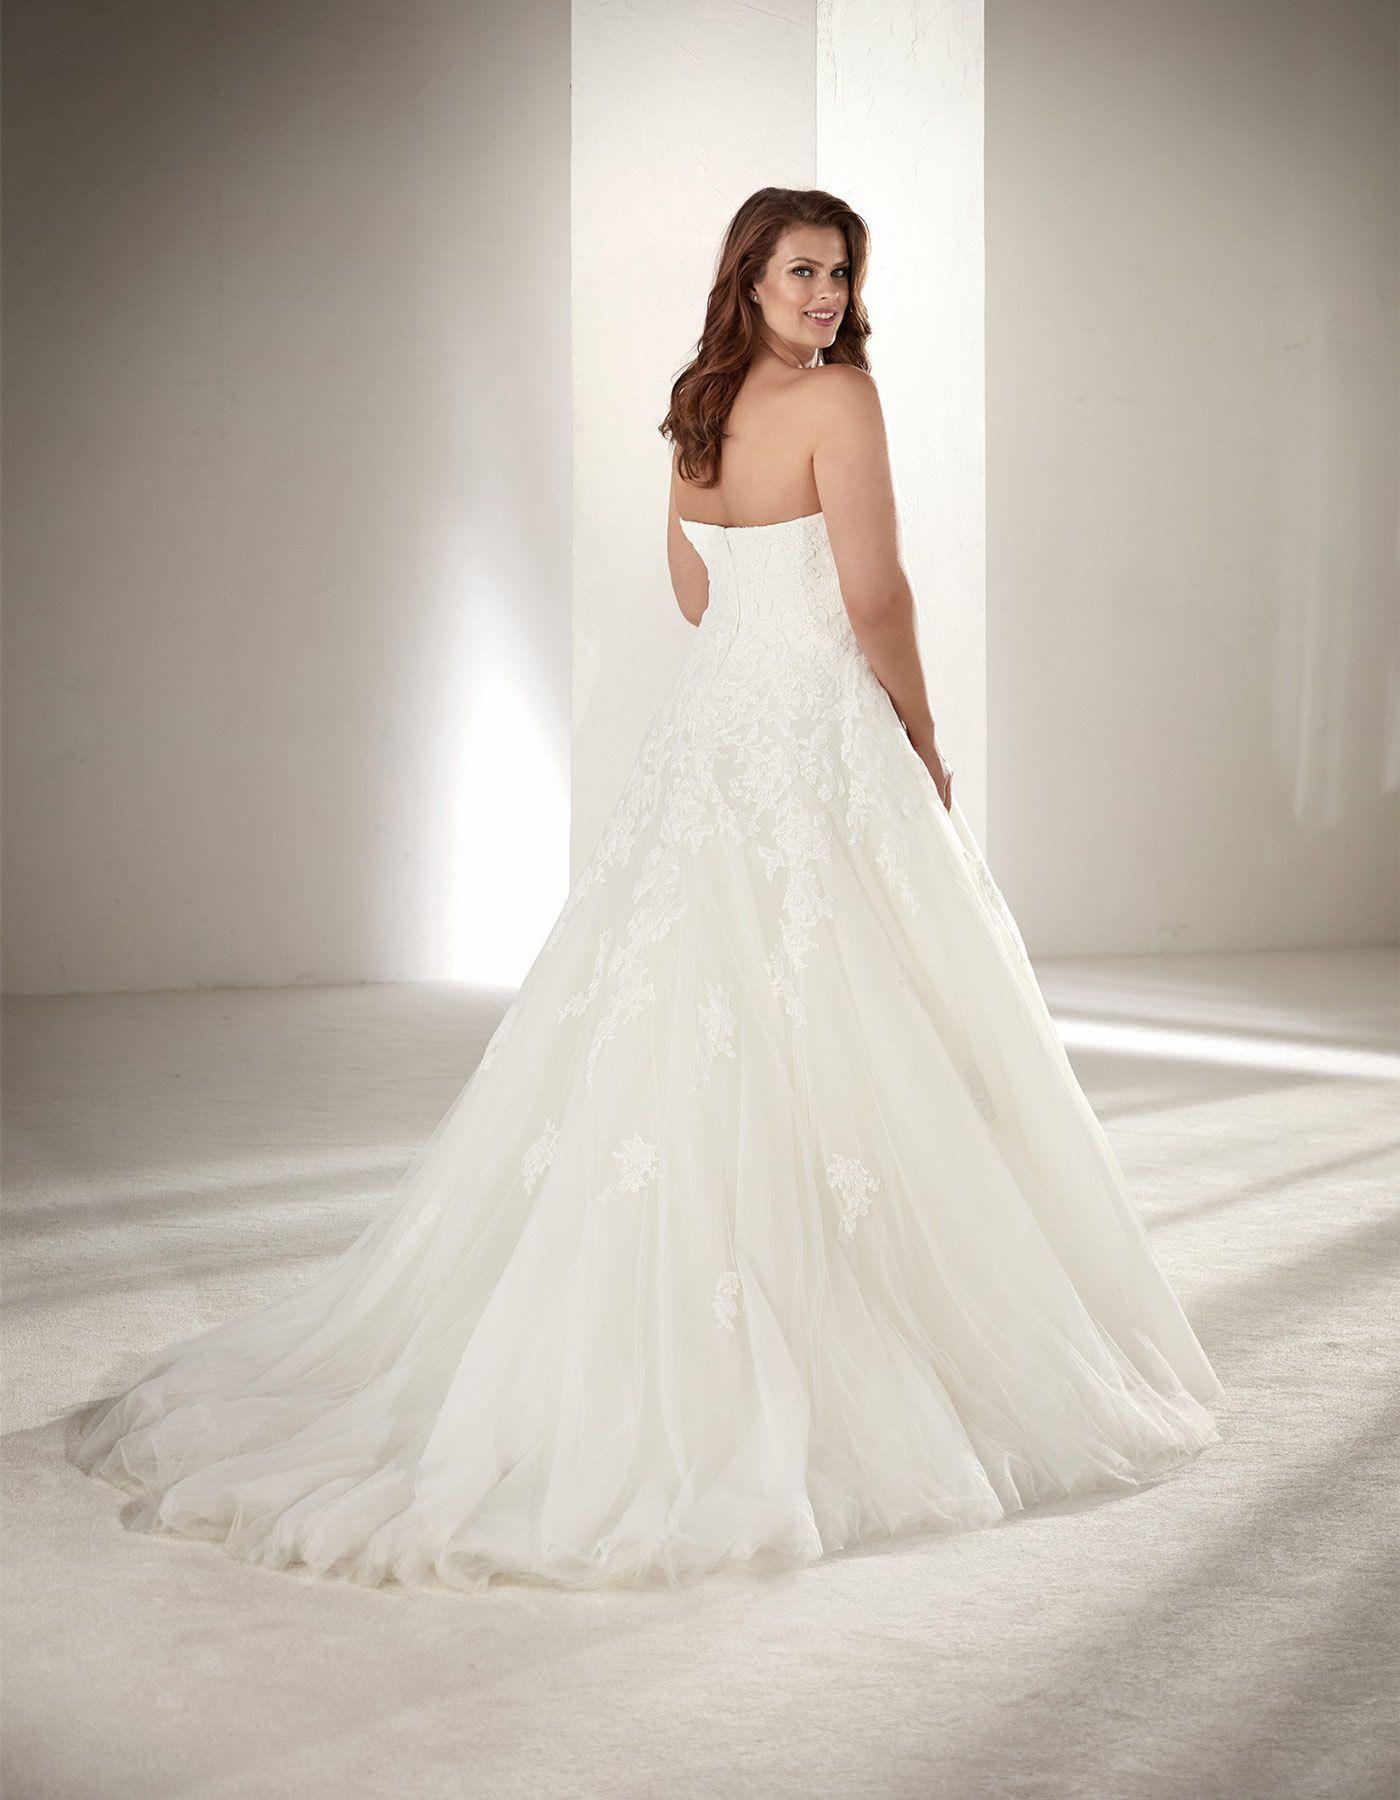 Plus size wedding dress Alcanar by Pronovias Some brides who feel